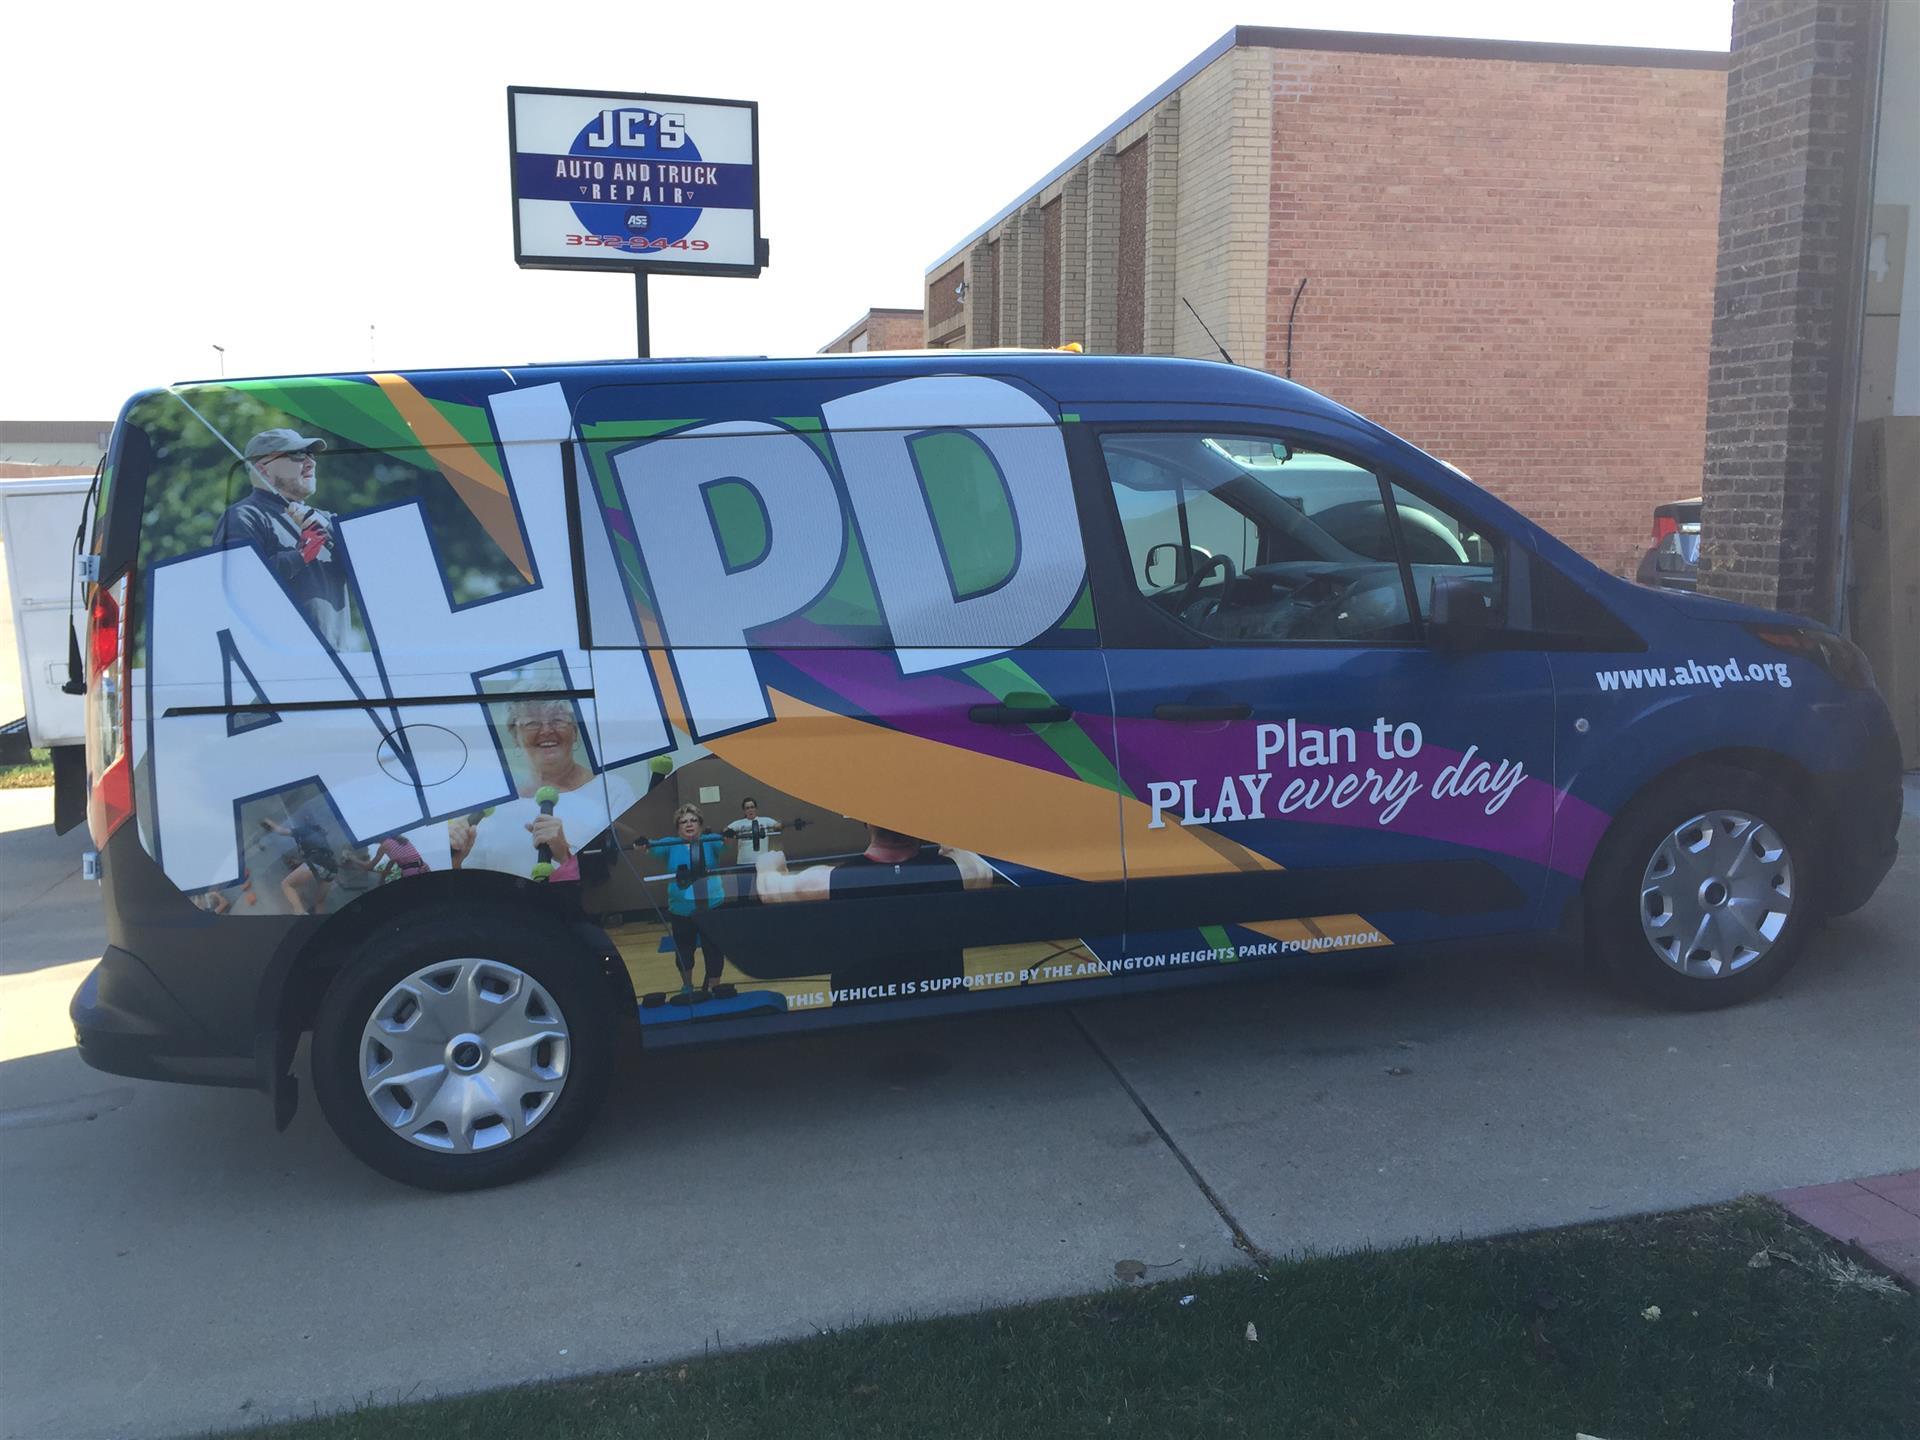 AHPD Vehicle Wrap